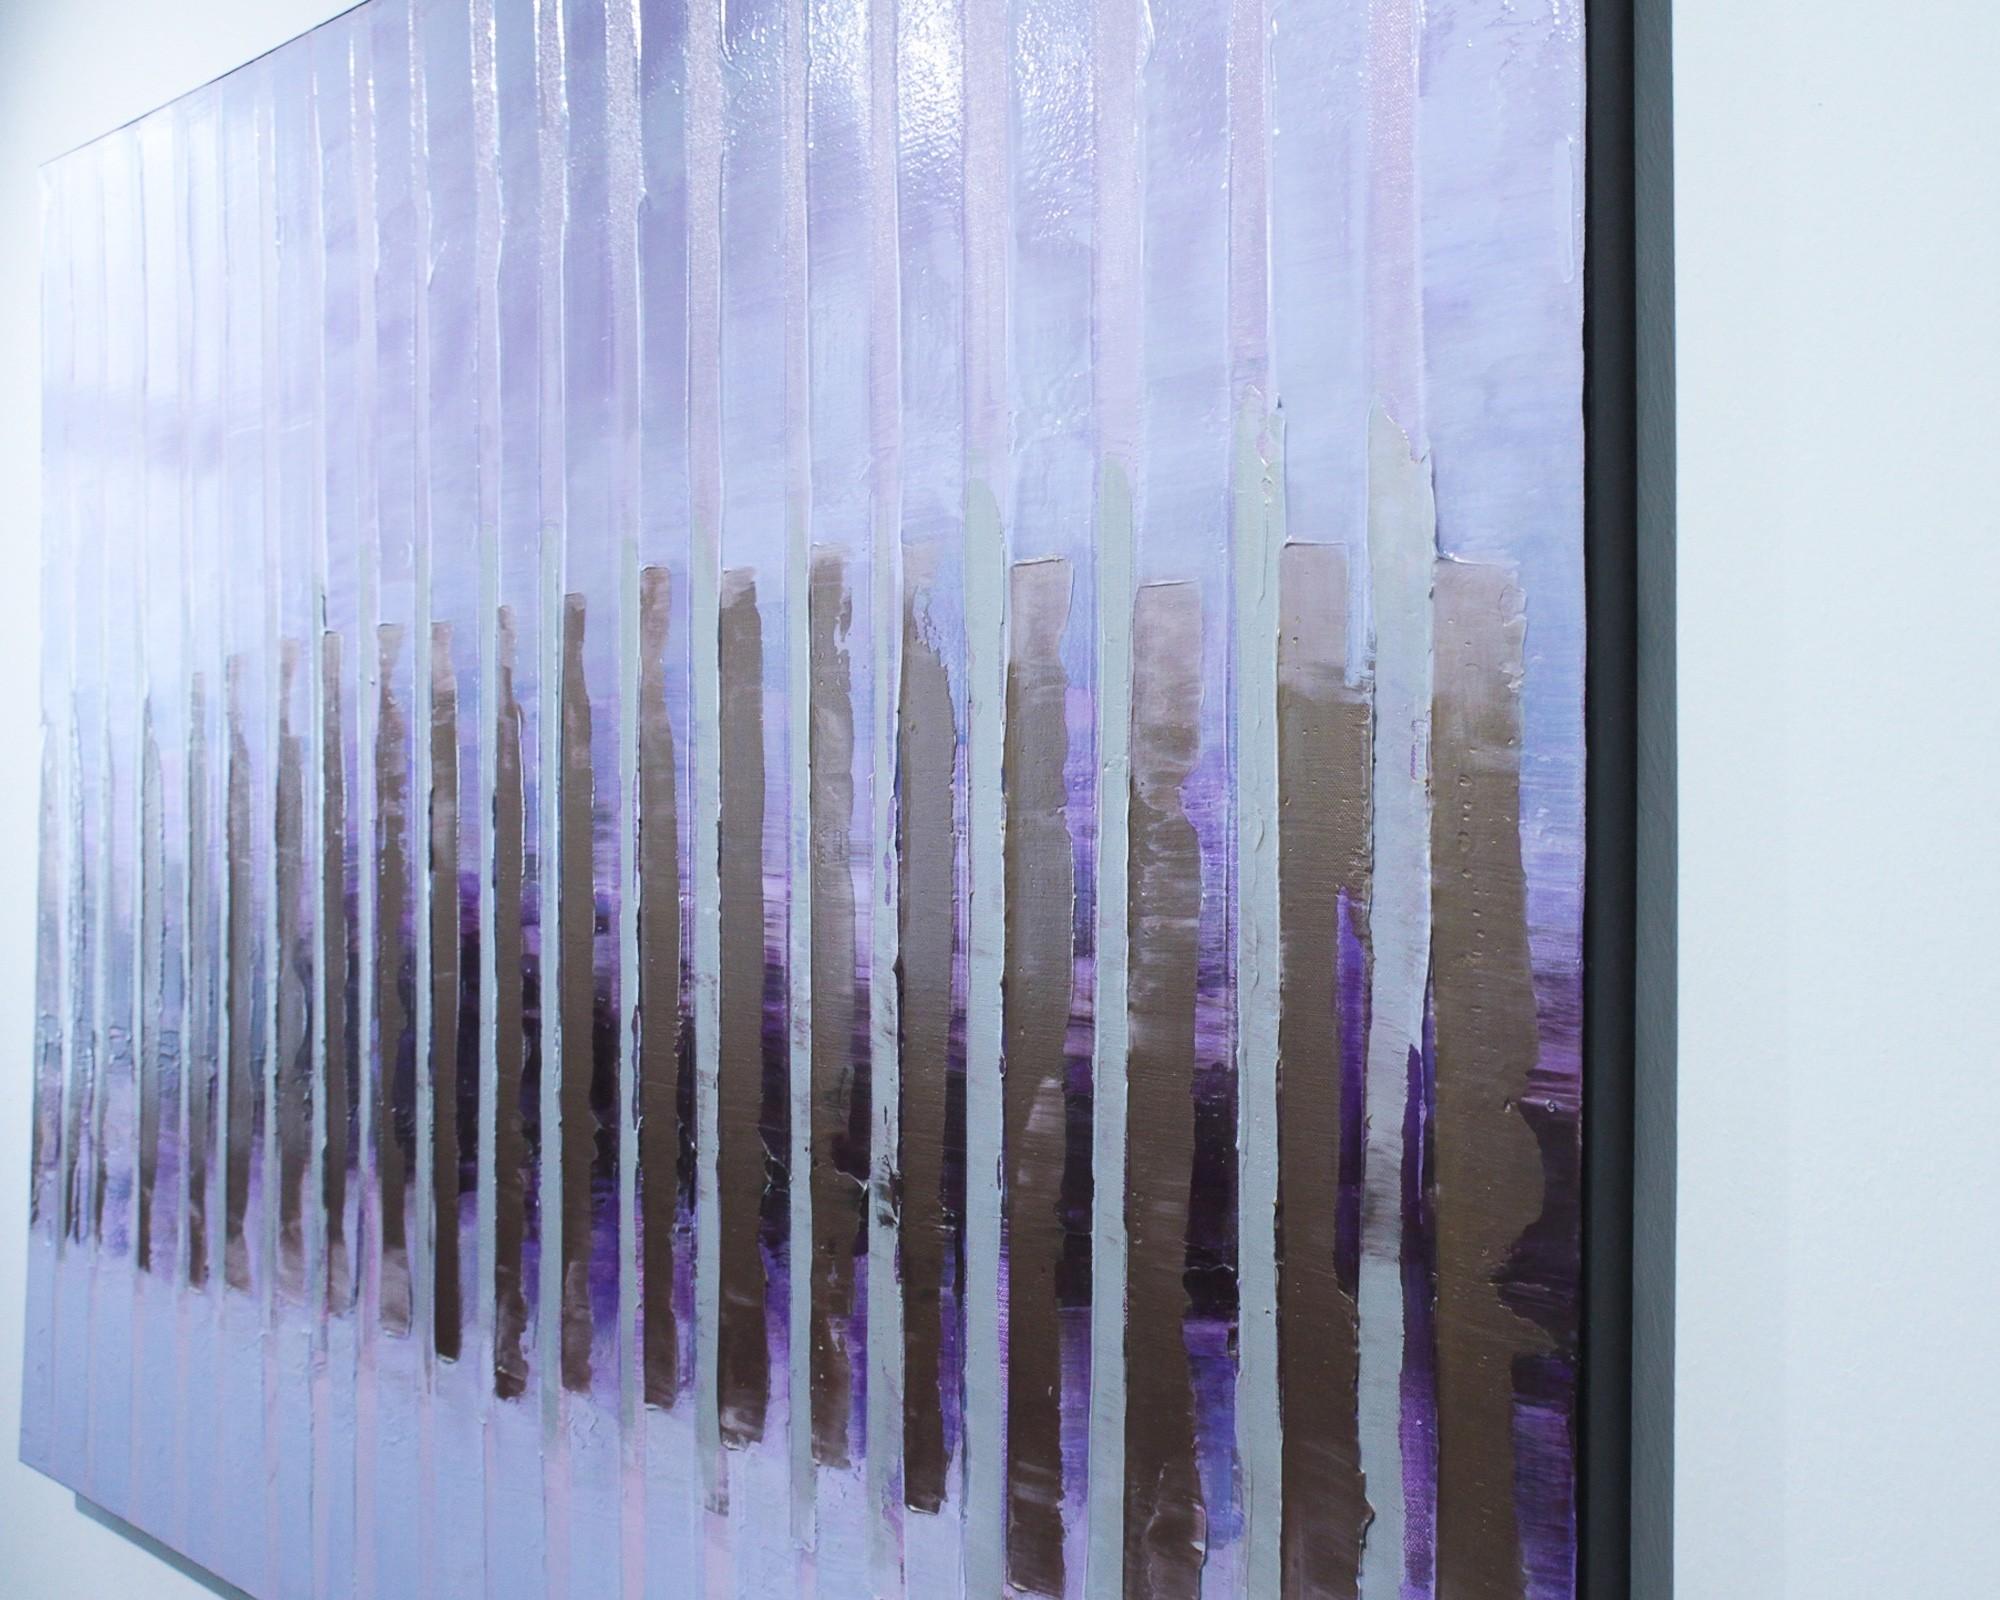 Pink November | Malerei von Lali Torma | Acryl auf Leinwand, abstrakt (3)